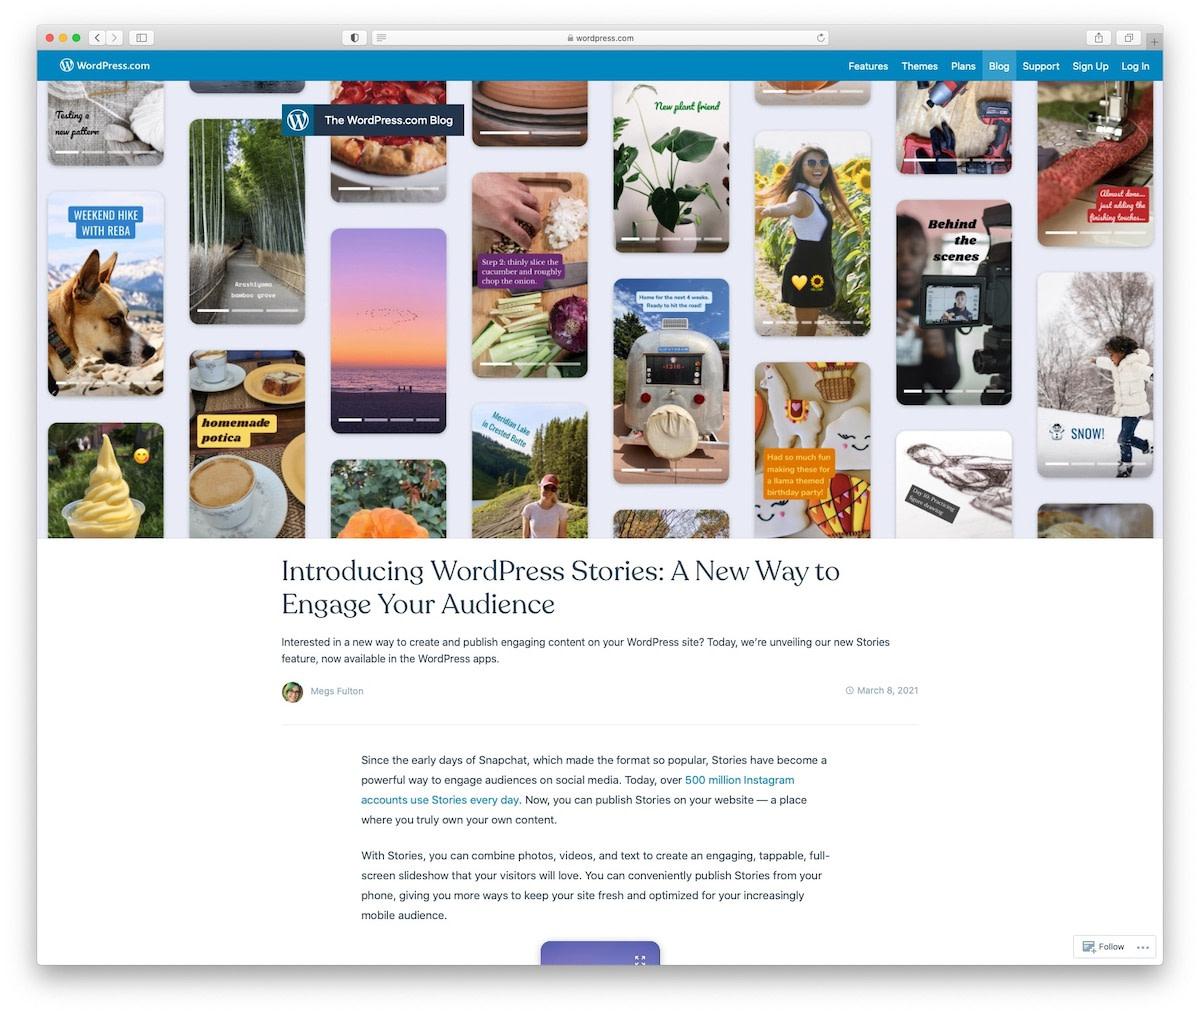 WordPress Stories